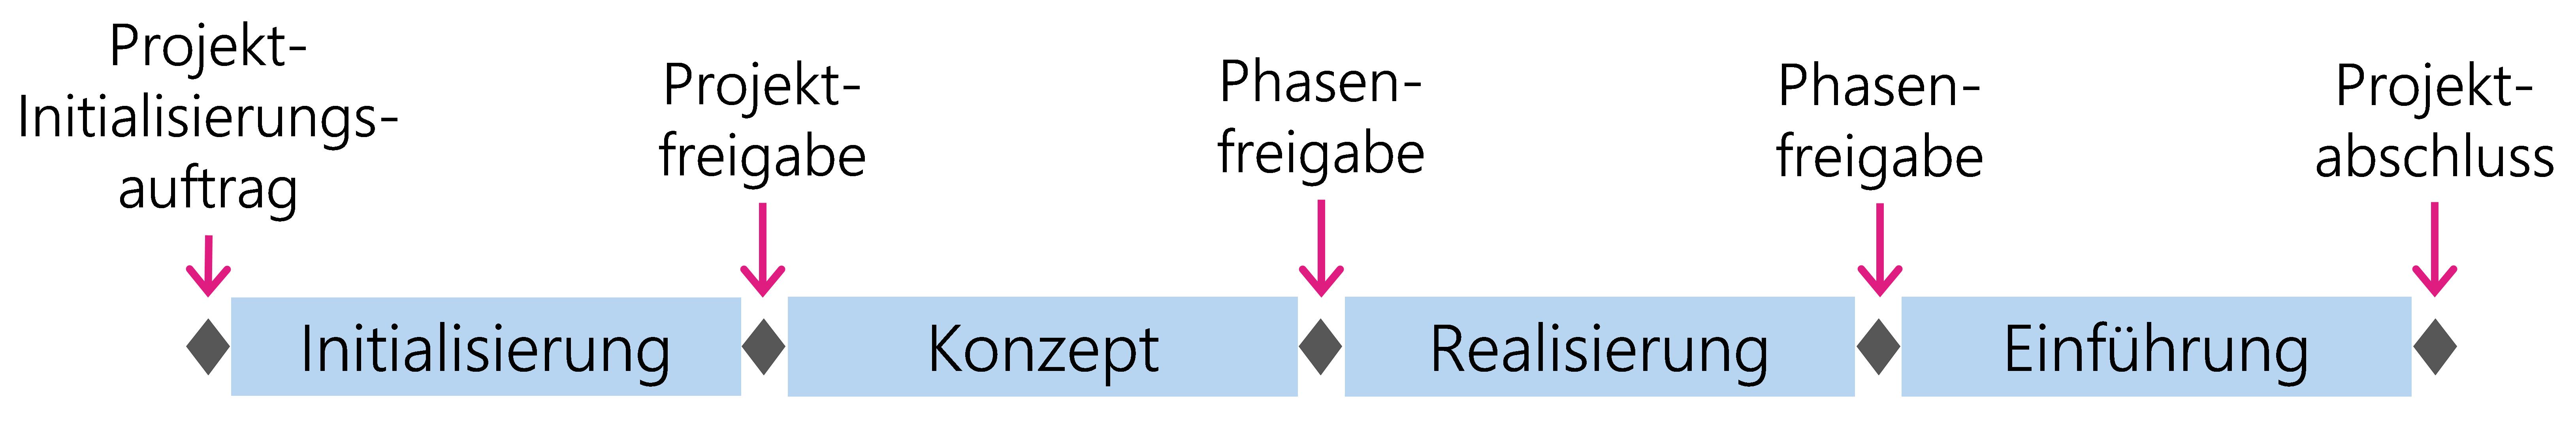 Abbildung 16: Die vier Phasen des HERMES-Phasenmodells